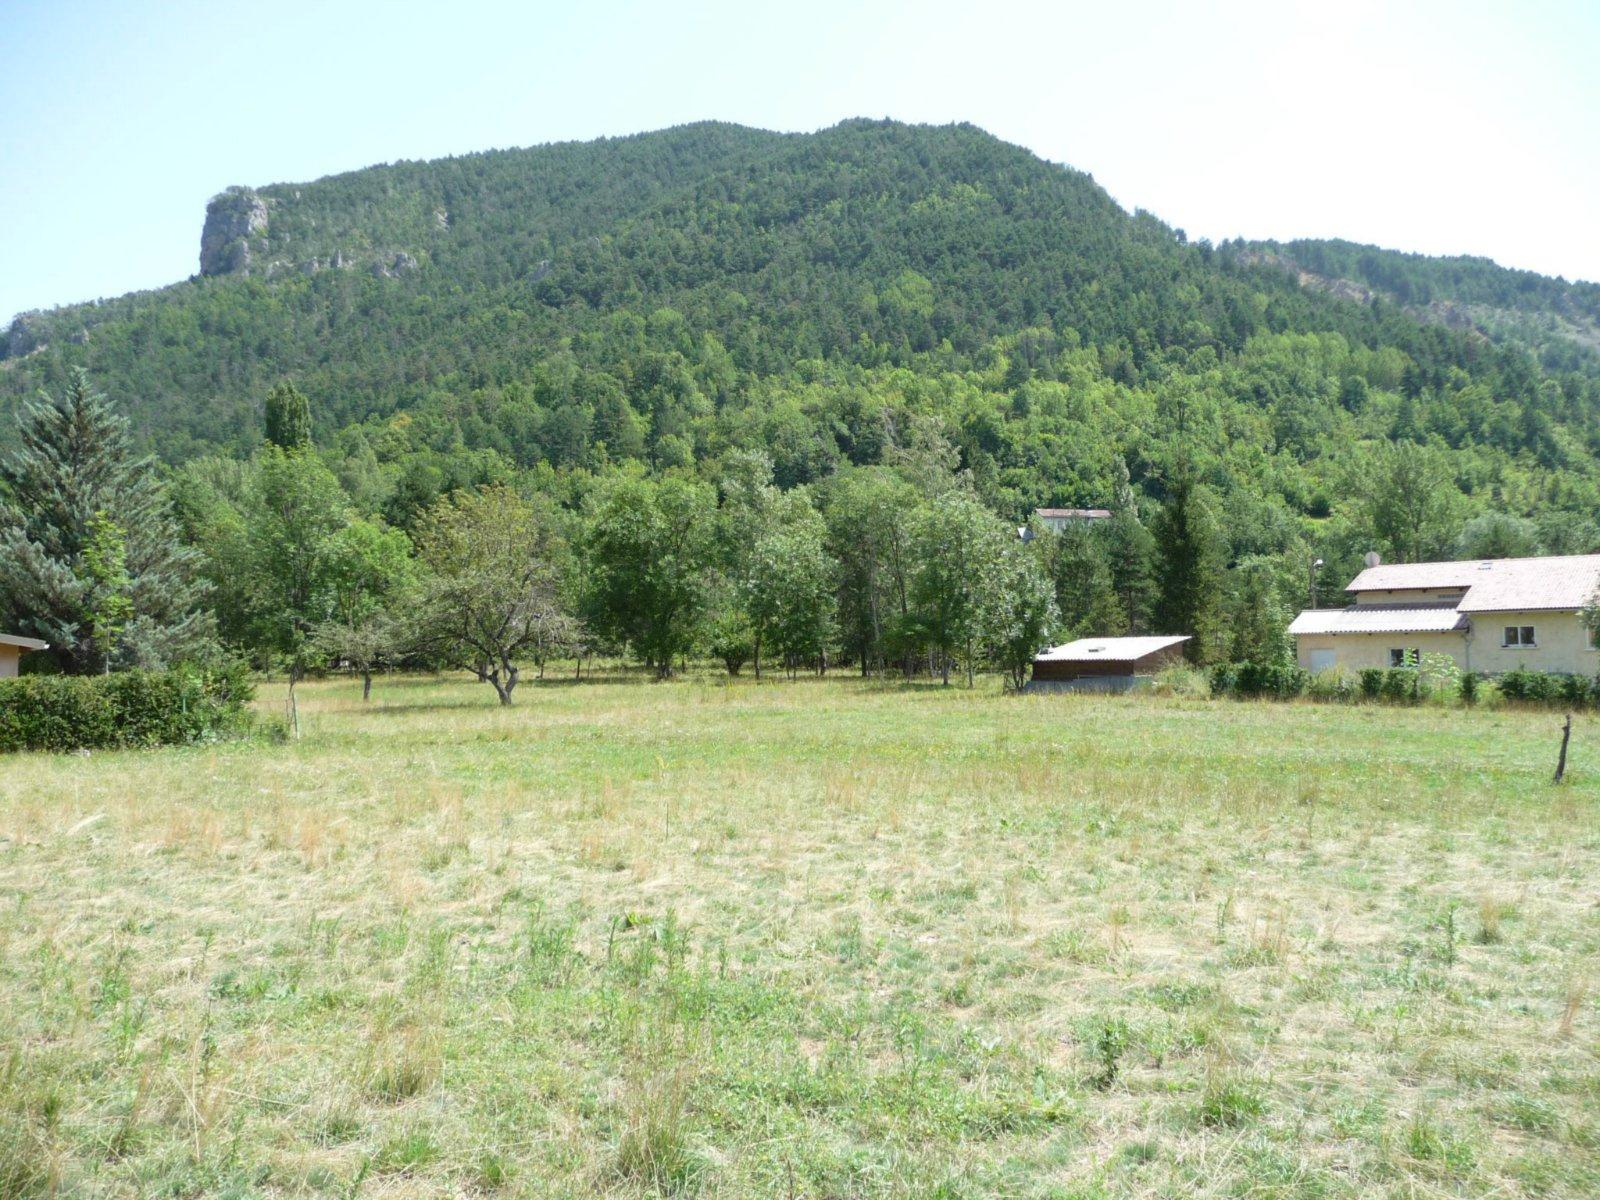 Vente terrain constructible plat 2500 m a guillaumes for Vente terrain constructible